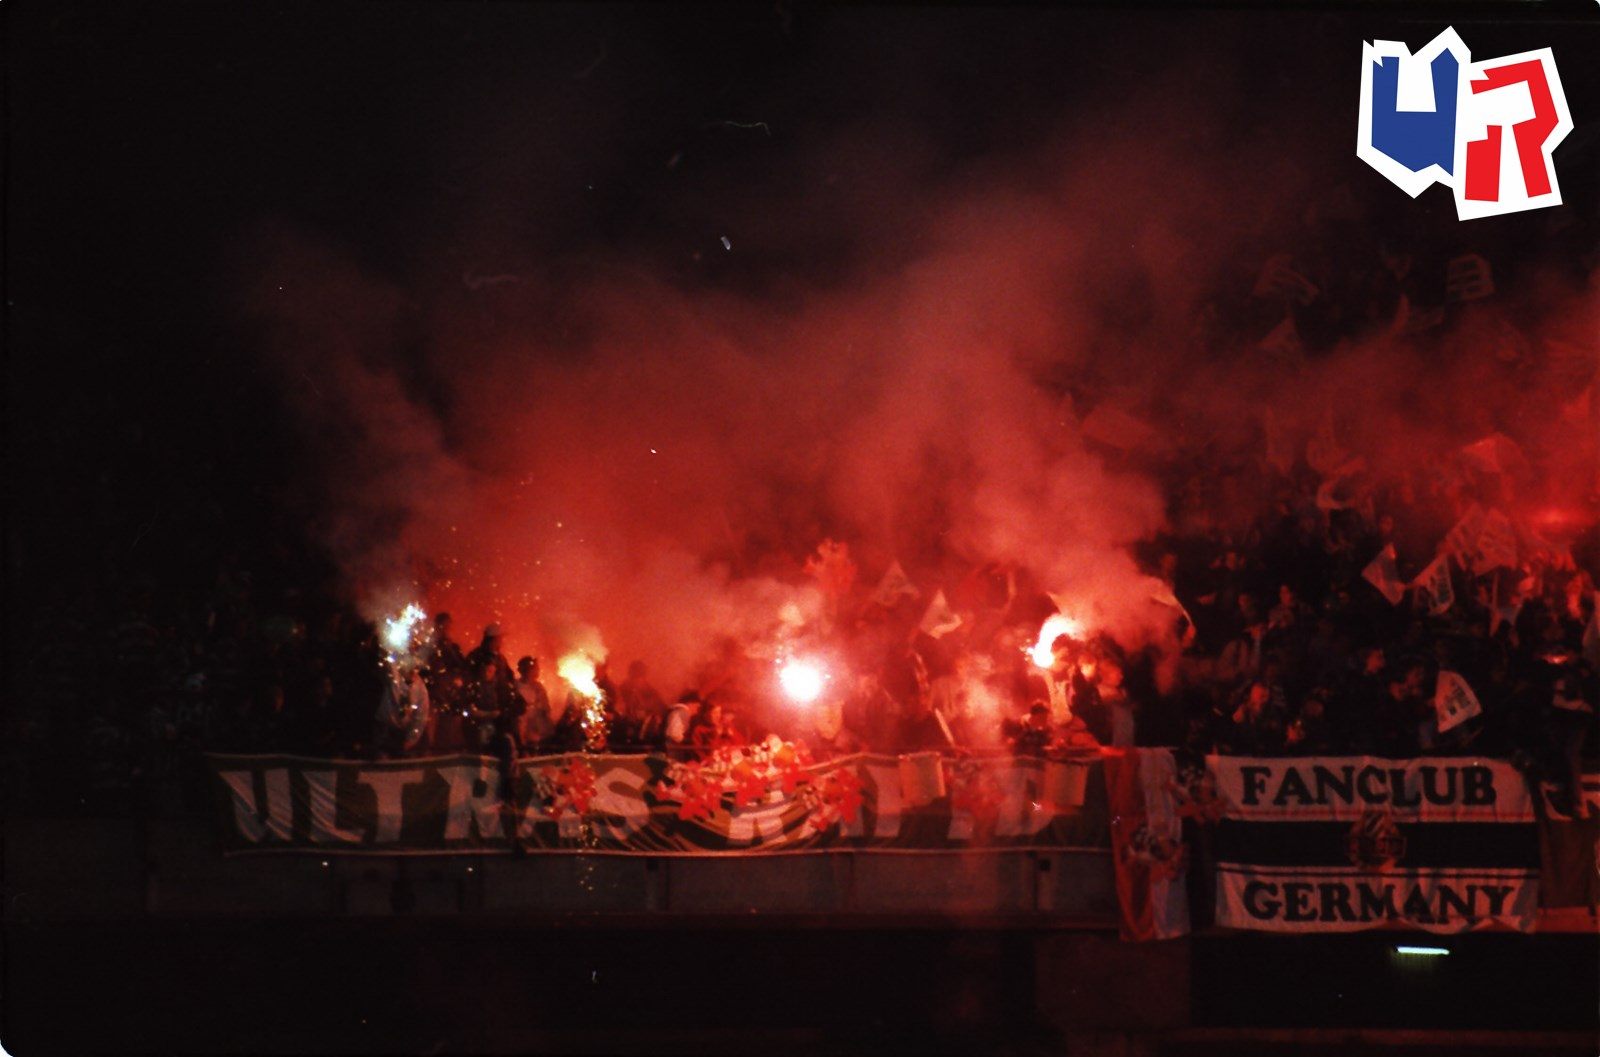 Juventus Turin SK Rapid Wien Ultras Rapid